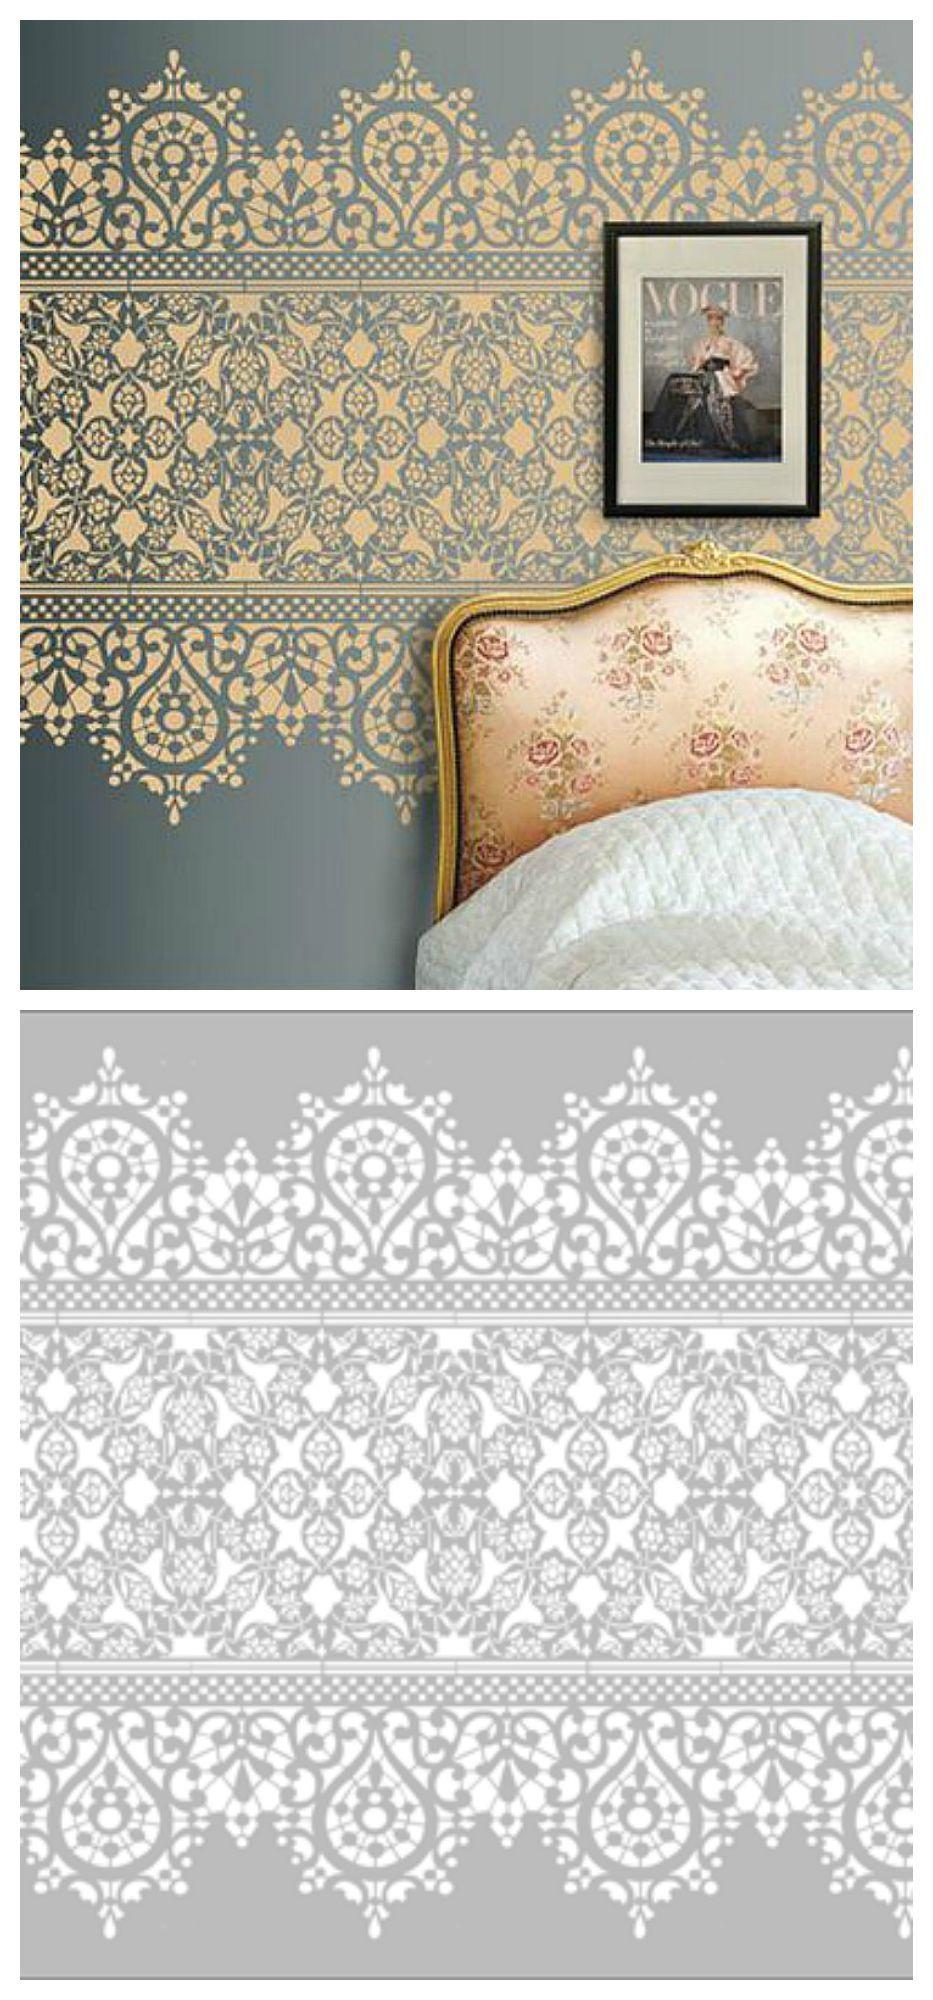 wall stencil lace wall stencil home decor diy pinterest room ideas